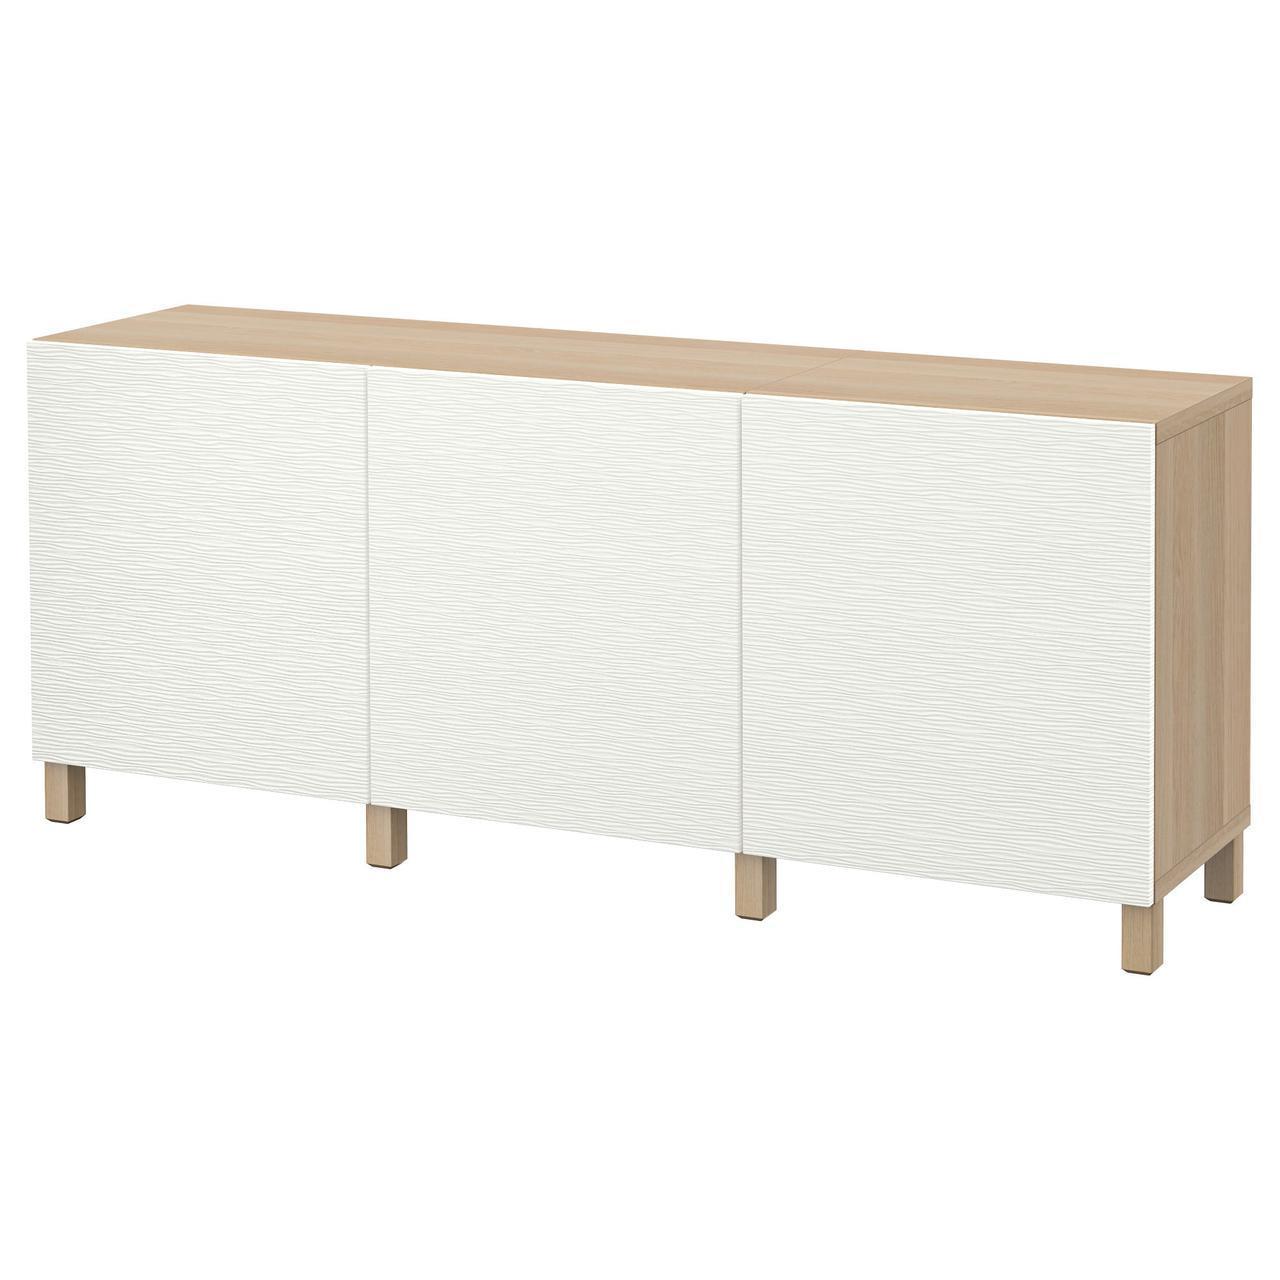 IKEA BESTA (091.399.03) Сервант/буфет